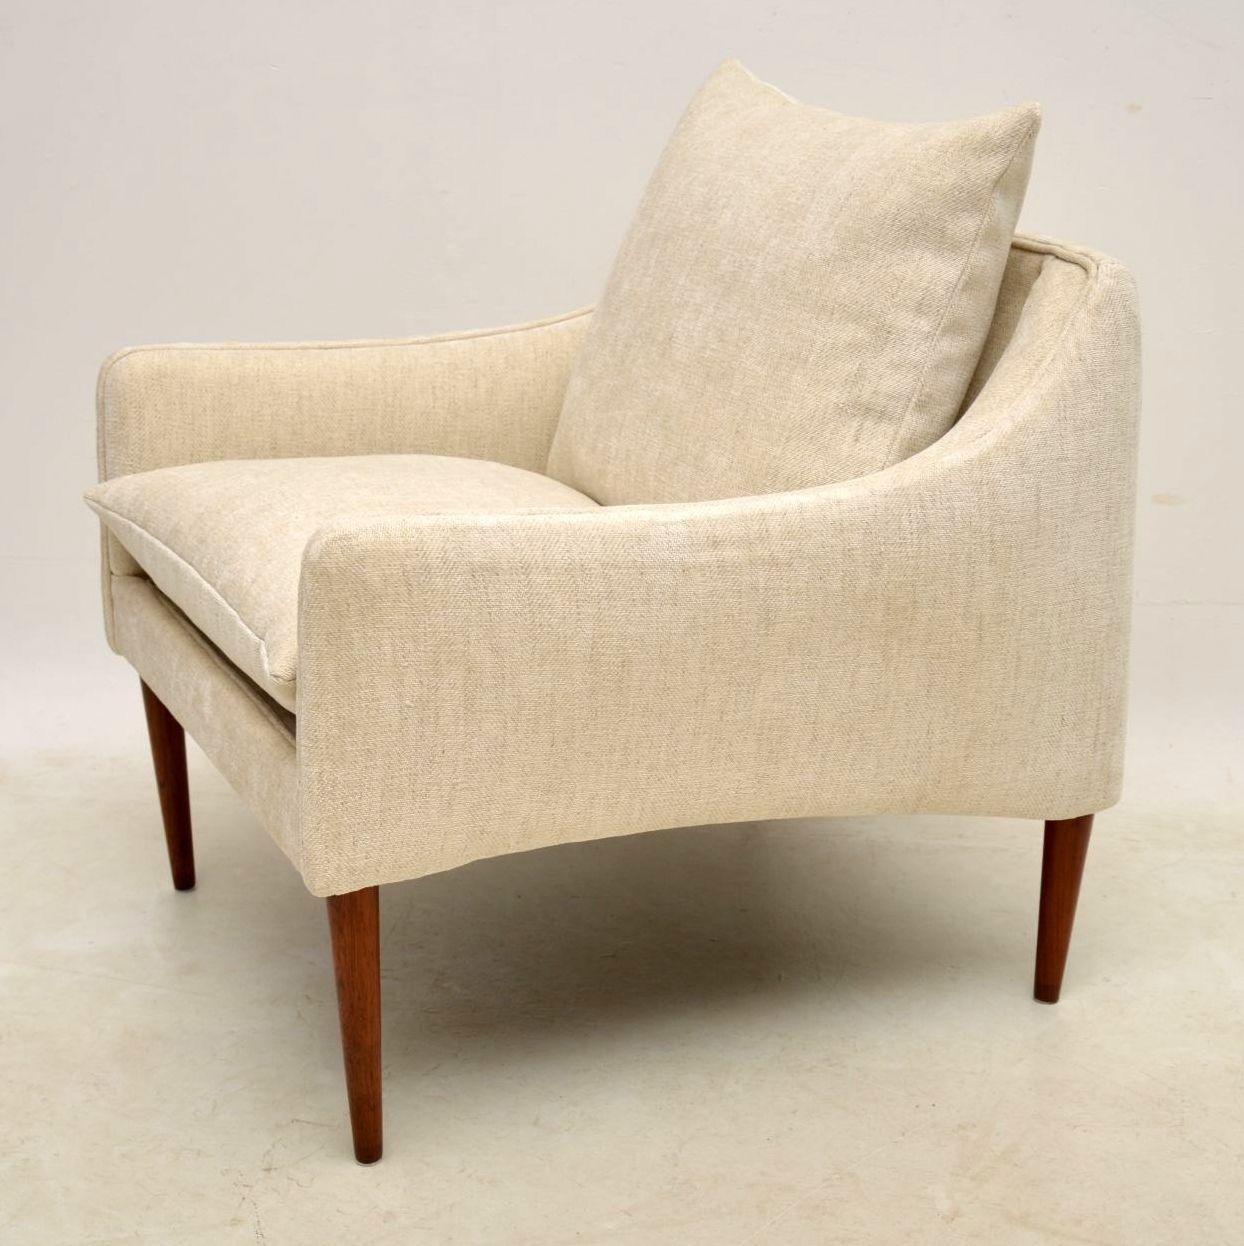 hans olsen model 800 danish armchair